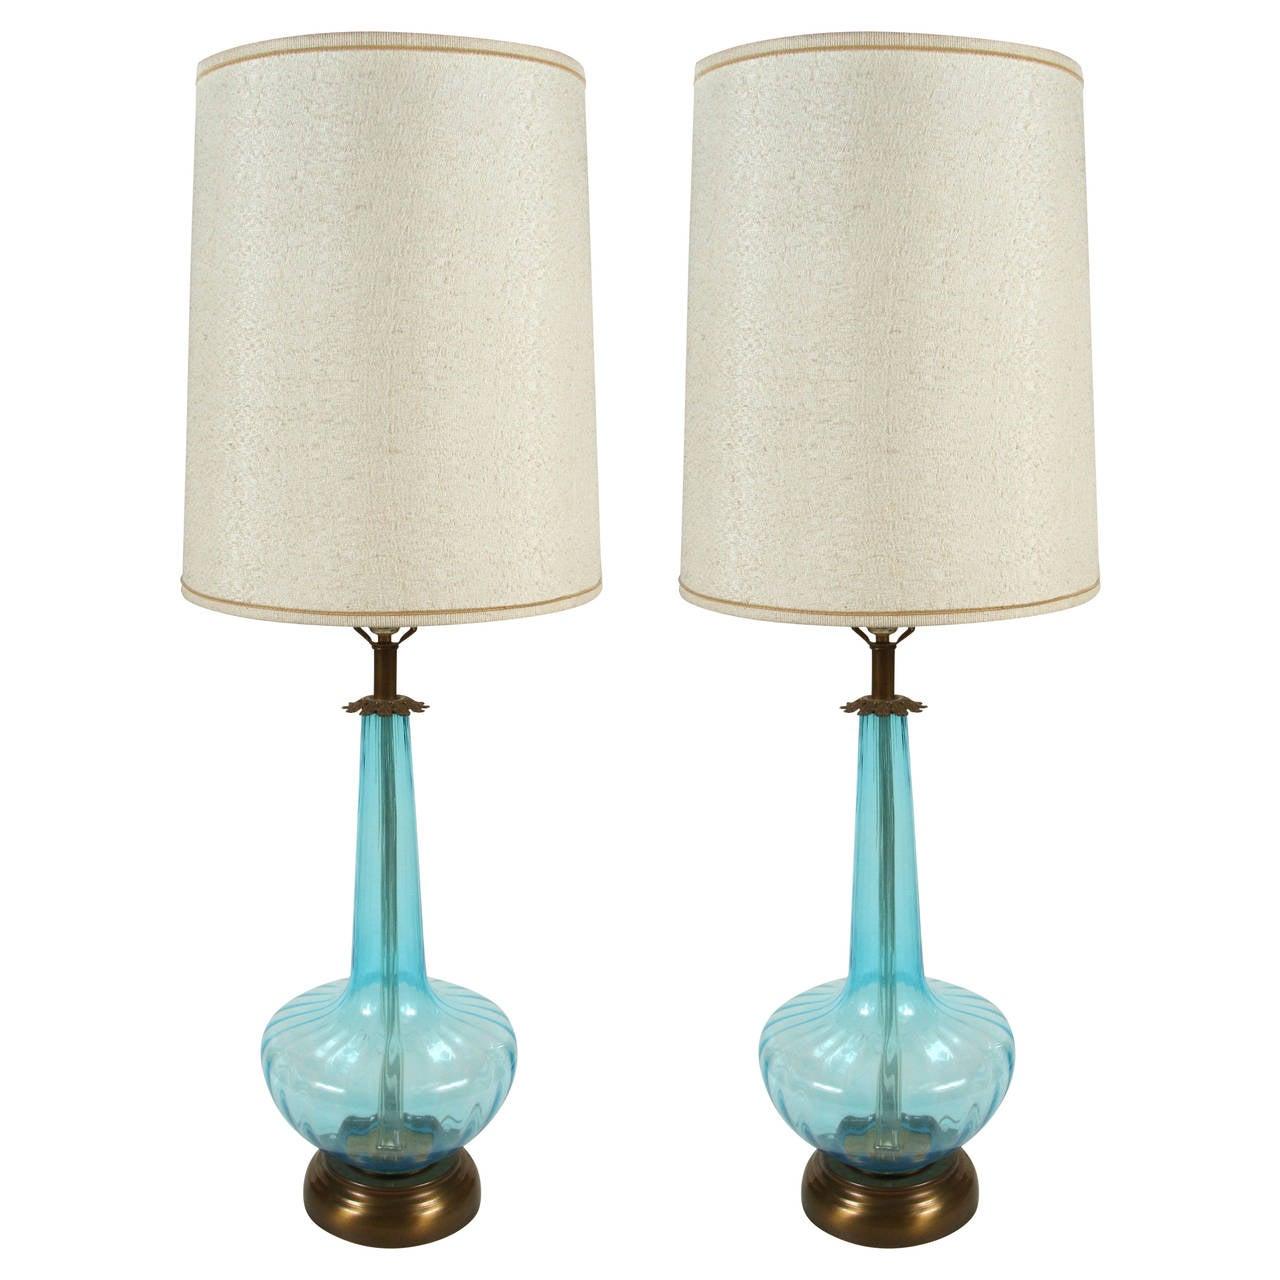 pair of vintage blown blue glass oversized lamps for sale at 1stdibs. Black Bedroom Furniture Sets. Home Design Ideas